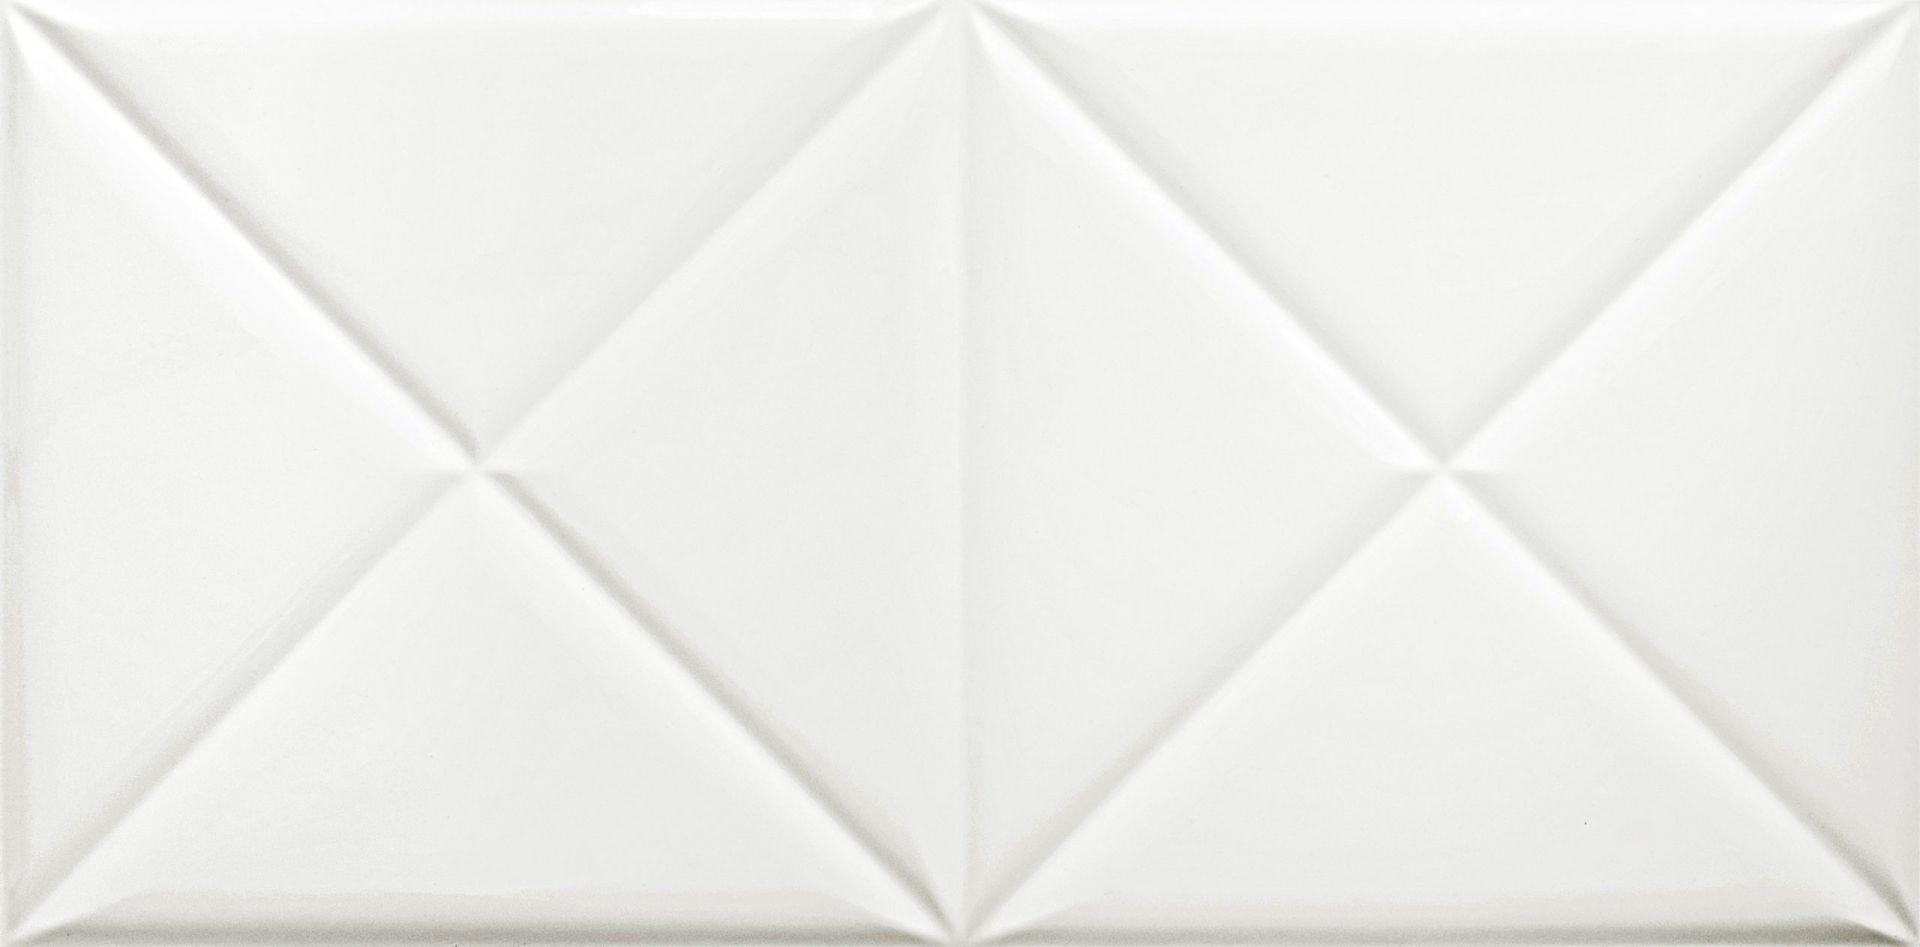 płytka ścienna wall super white lara shiny